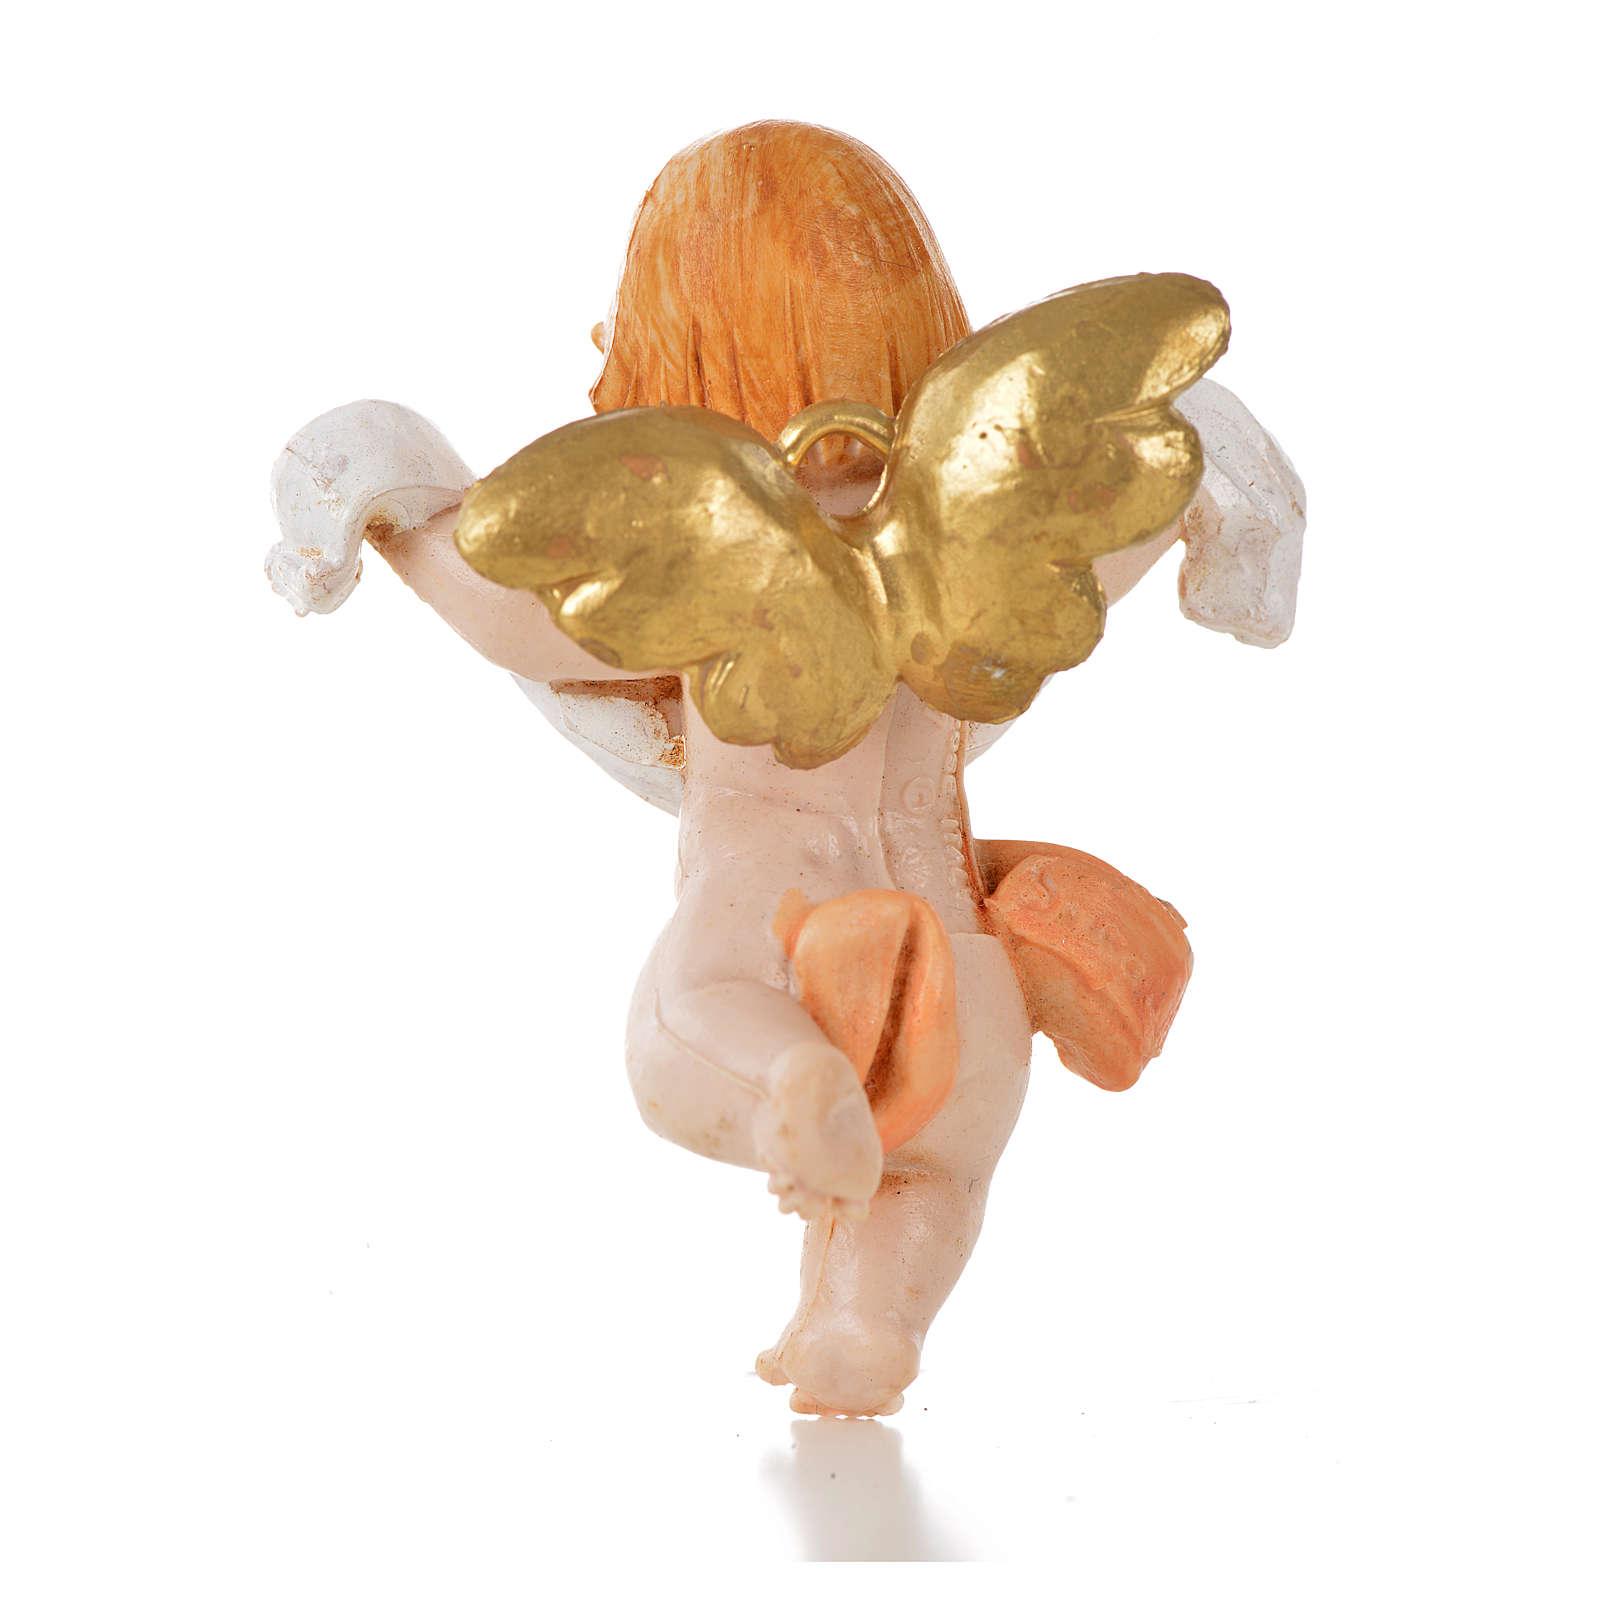 Ángel con paño rosado Fontanini 7 cm. símil porcelana 3